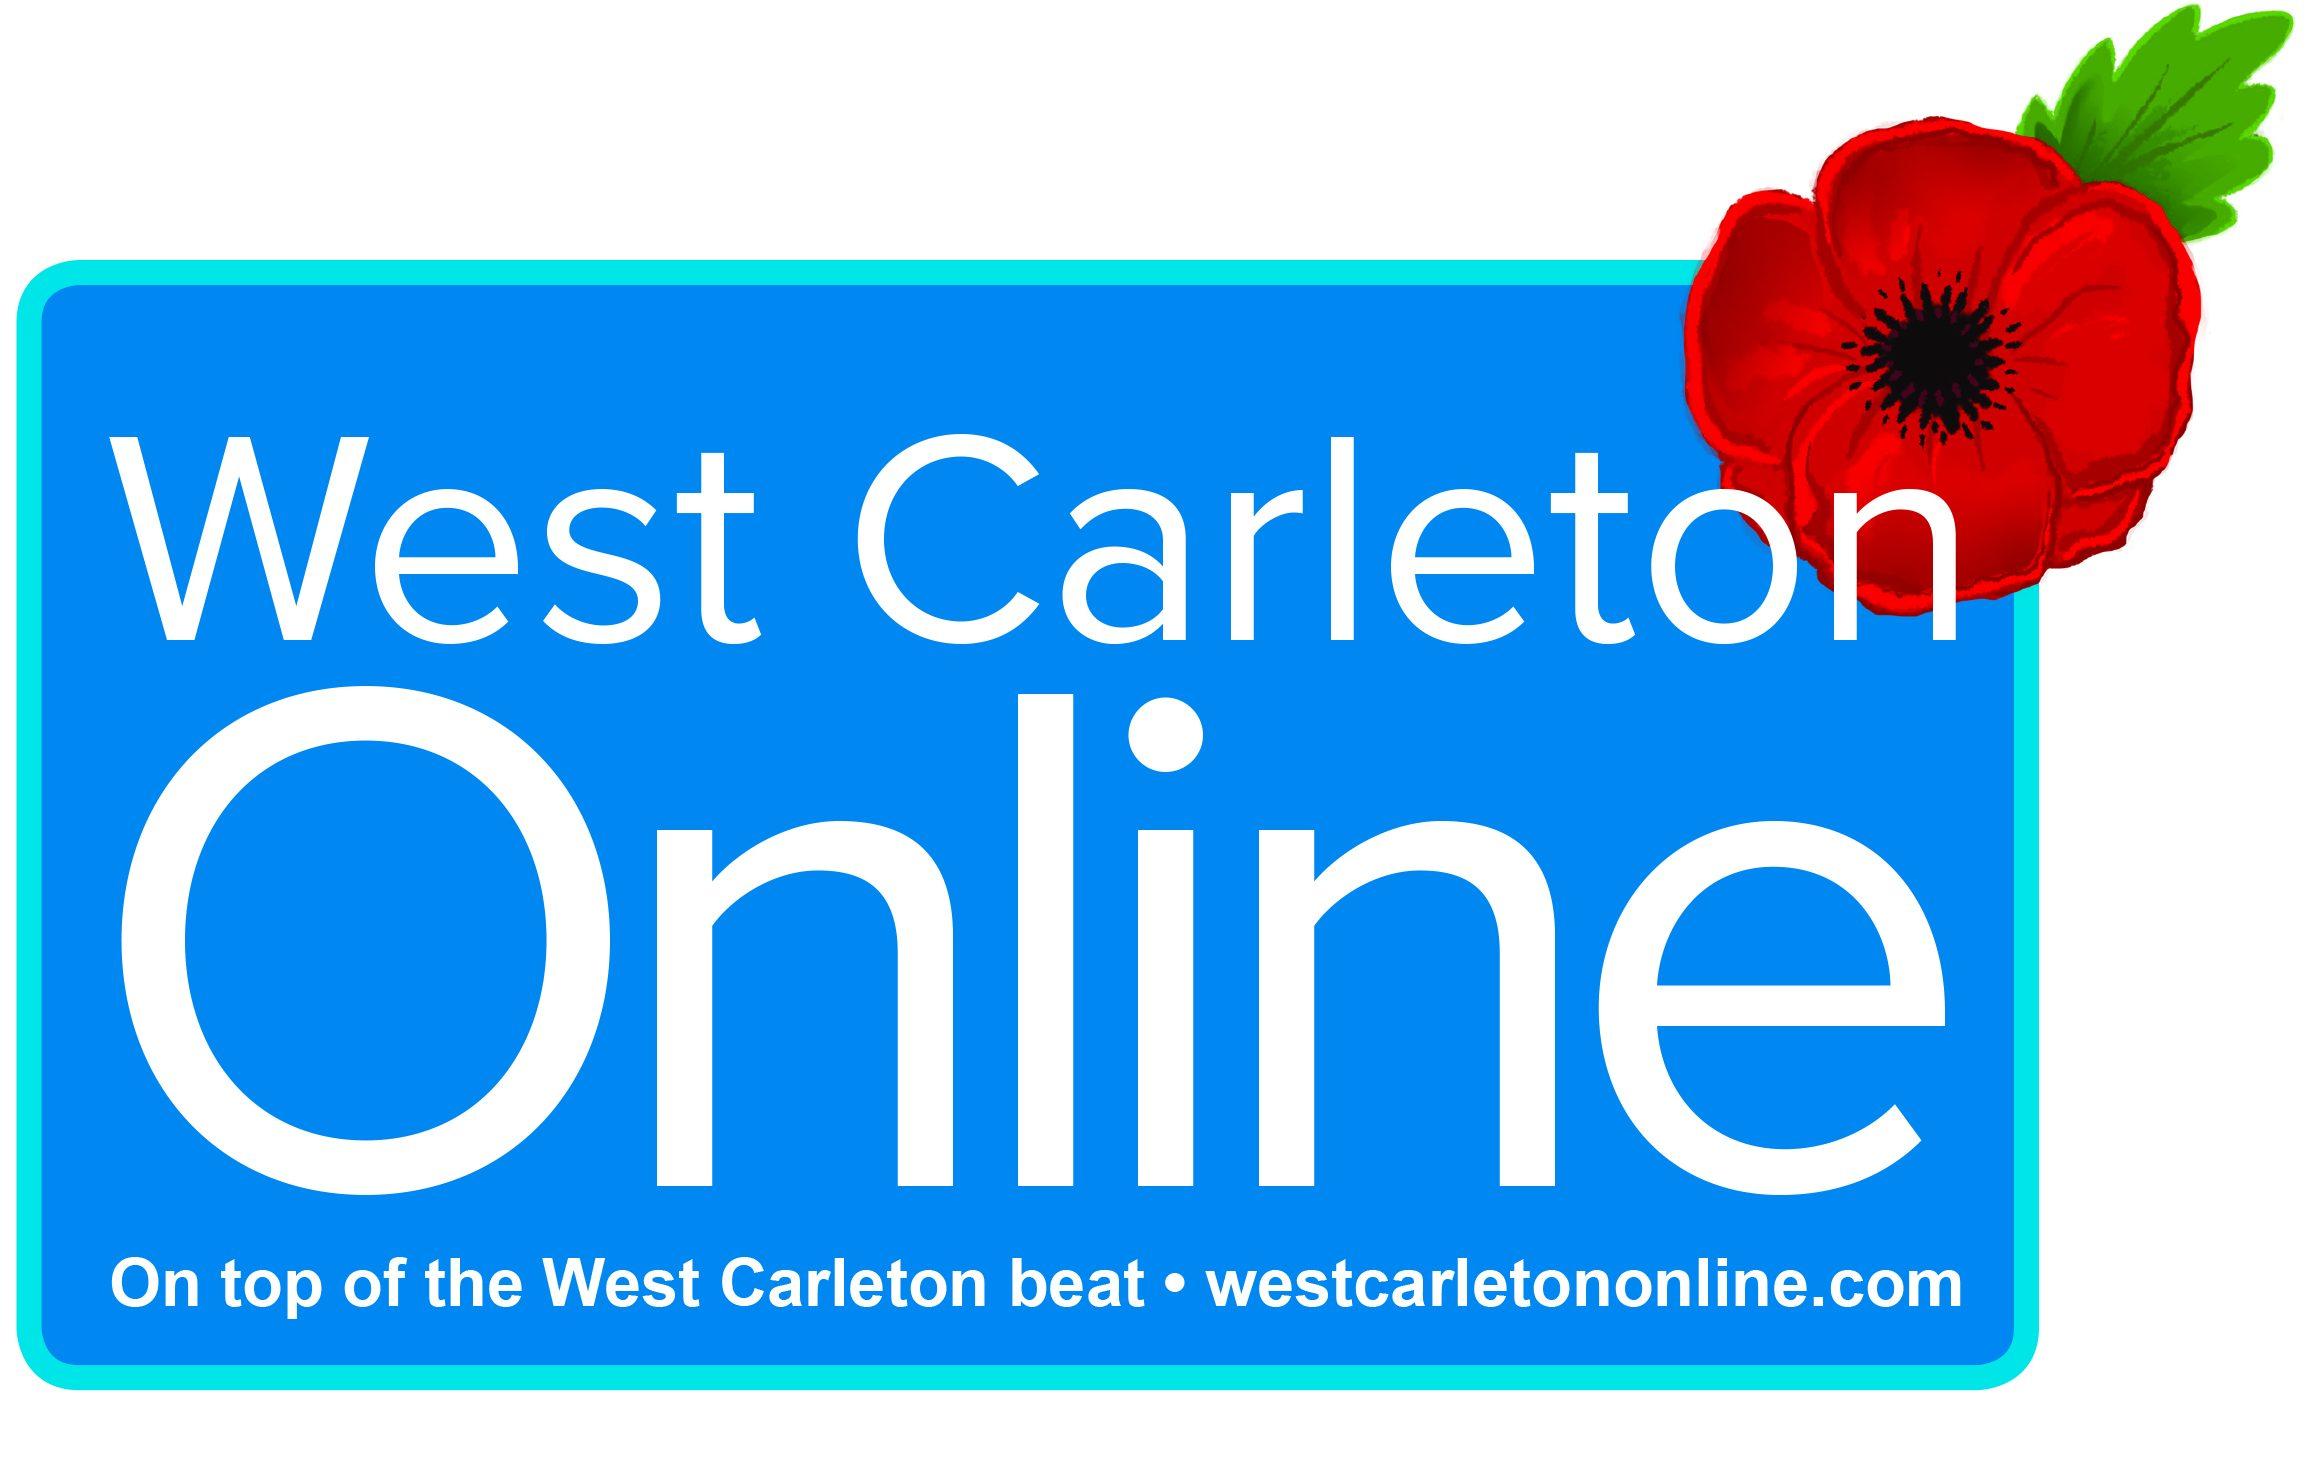 West Carleton Online